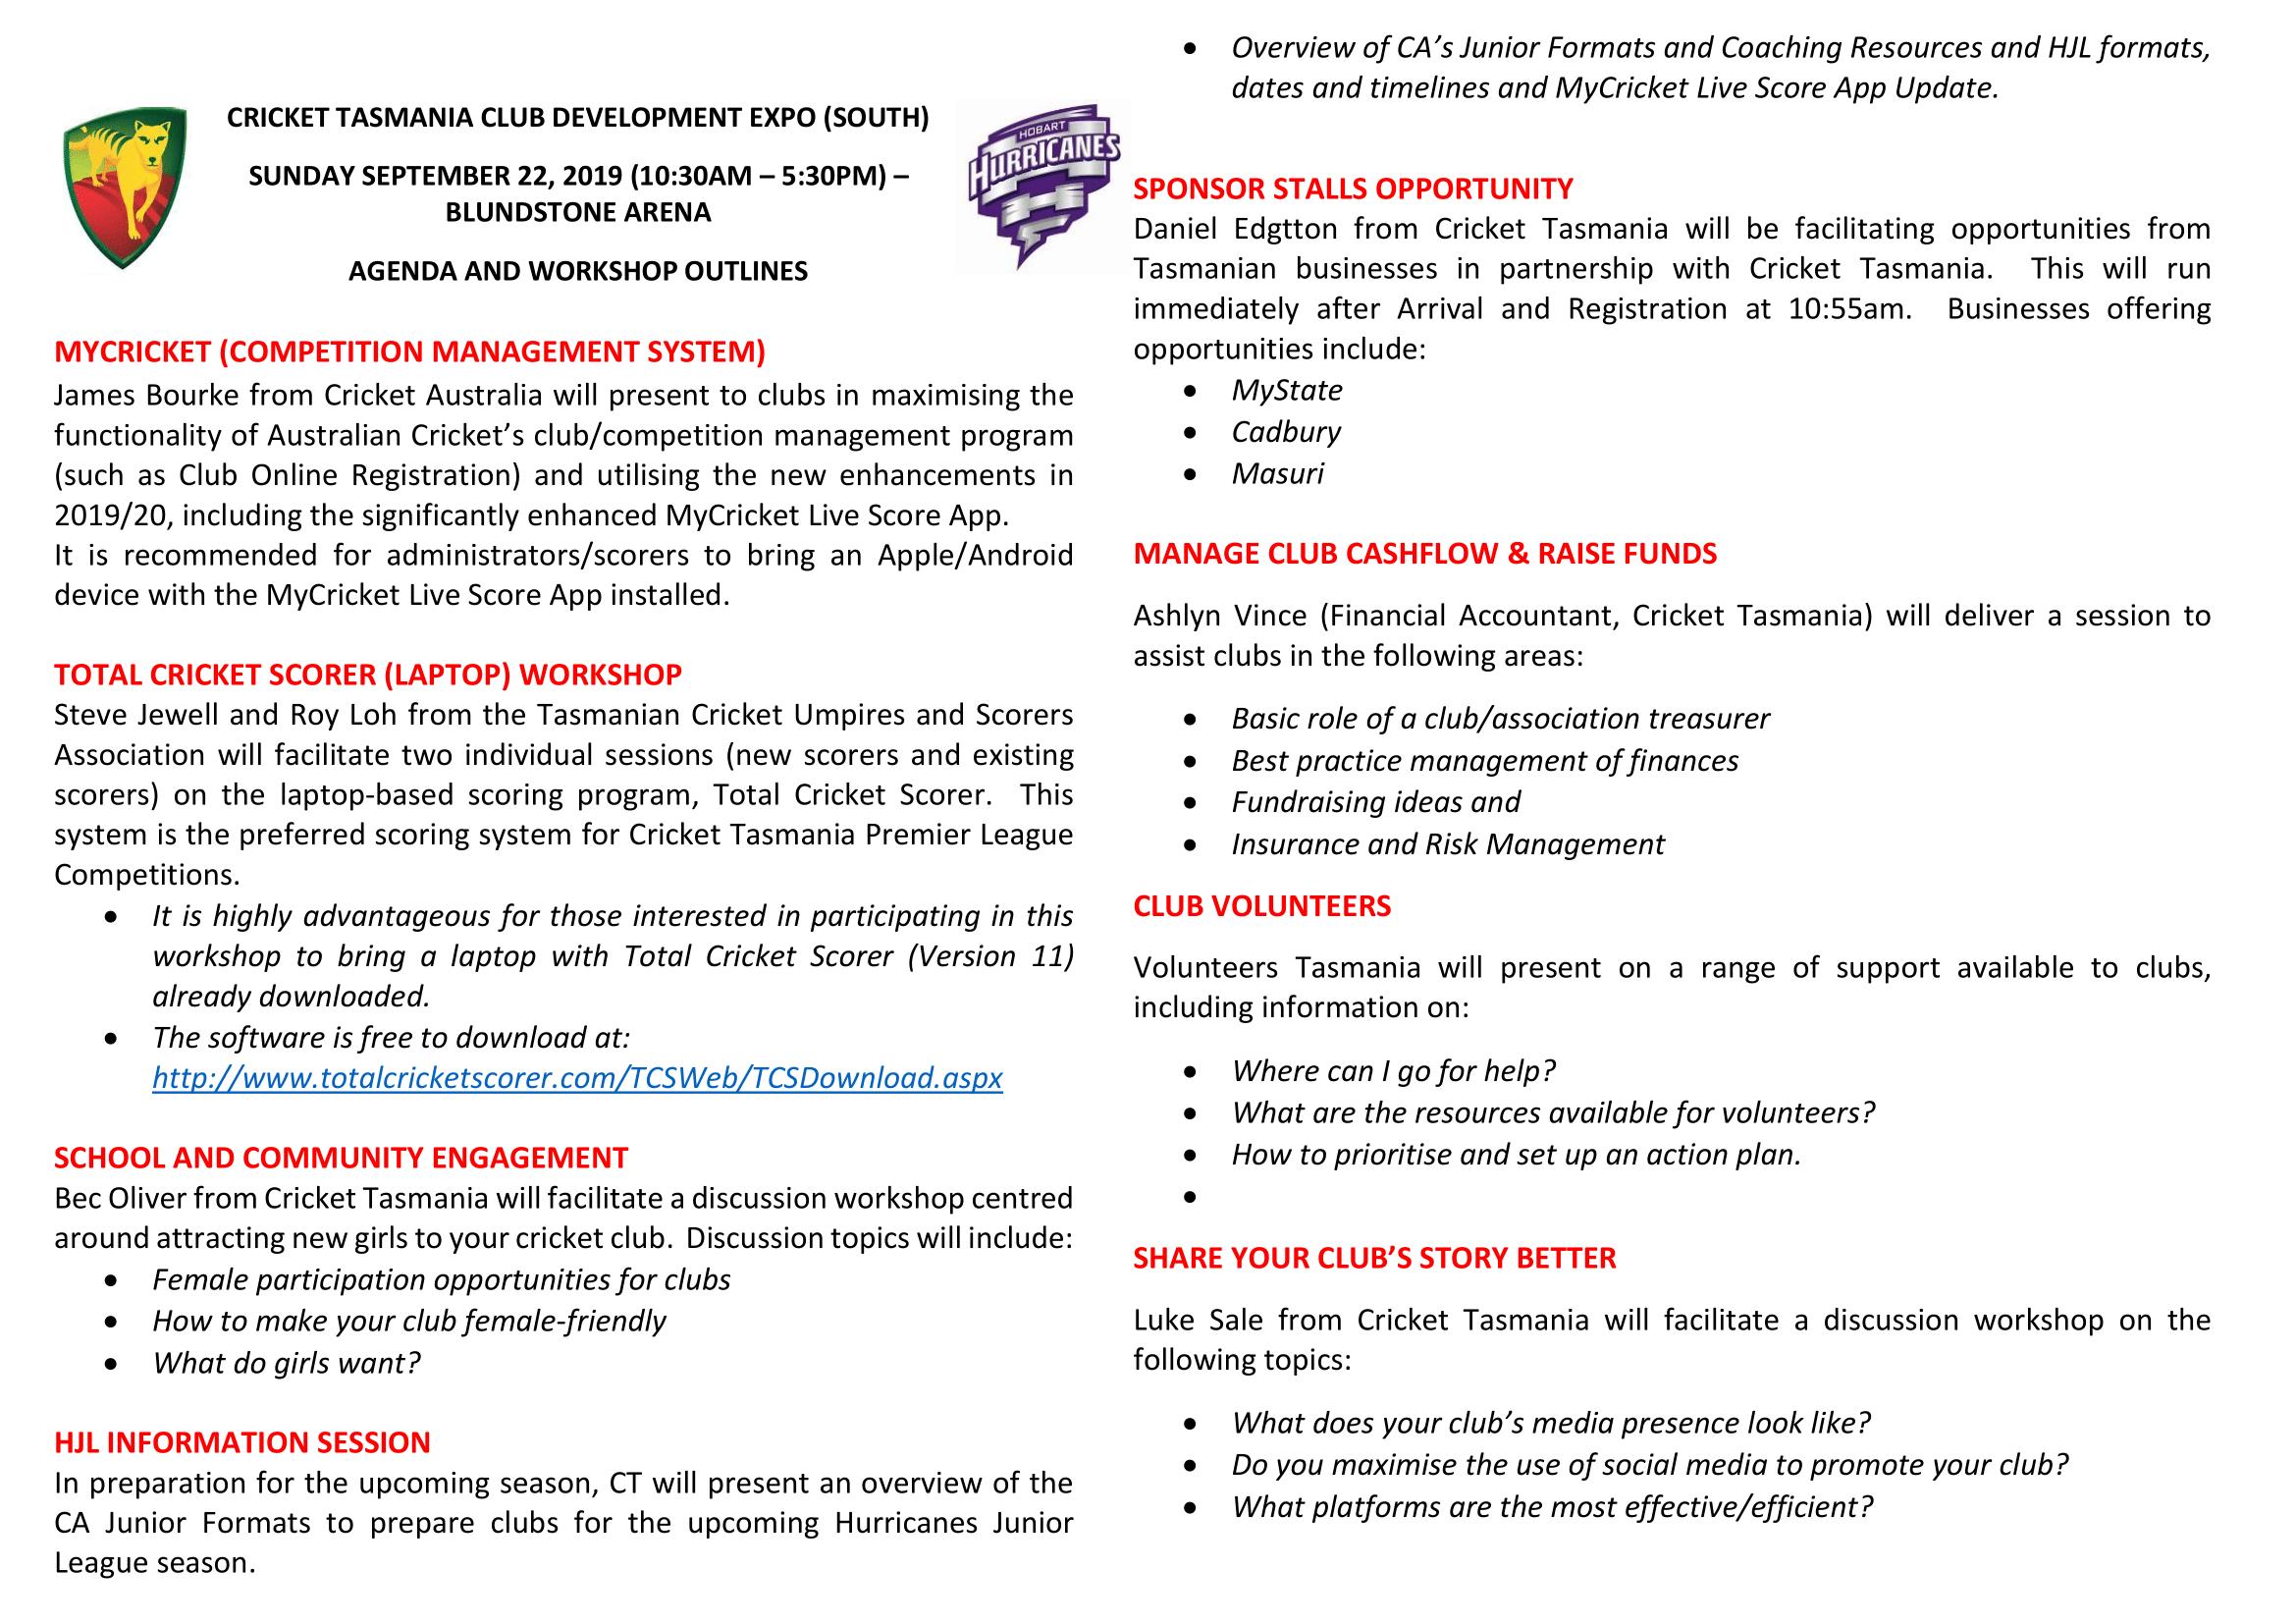 CT Club Development Expo 2019 - Southern Tasmania Survey